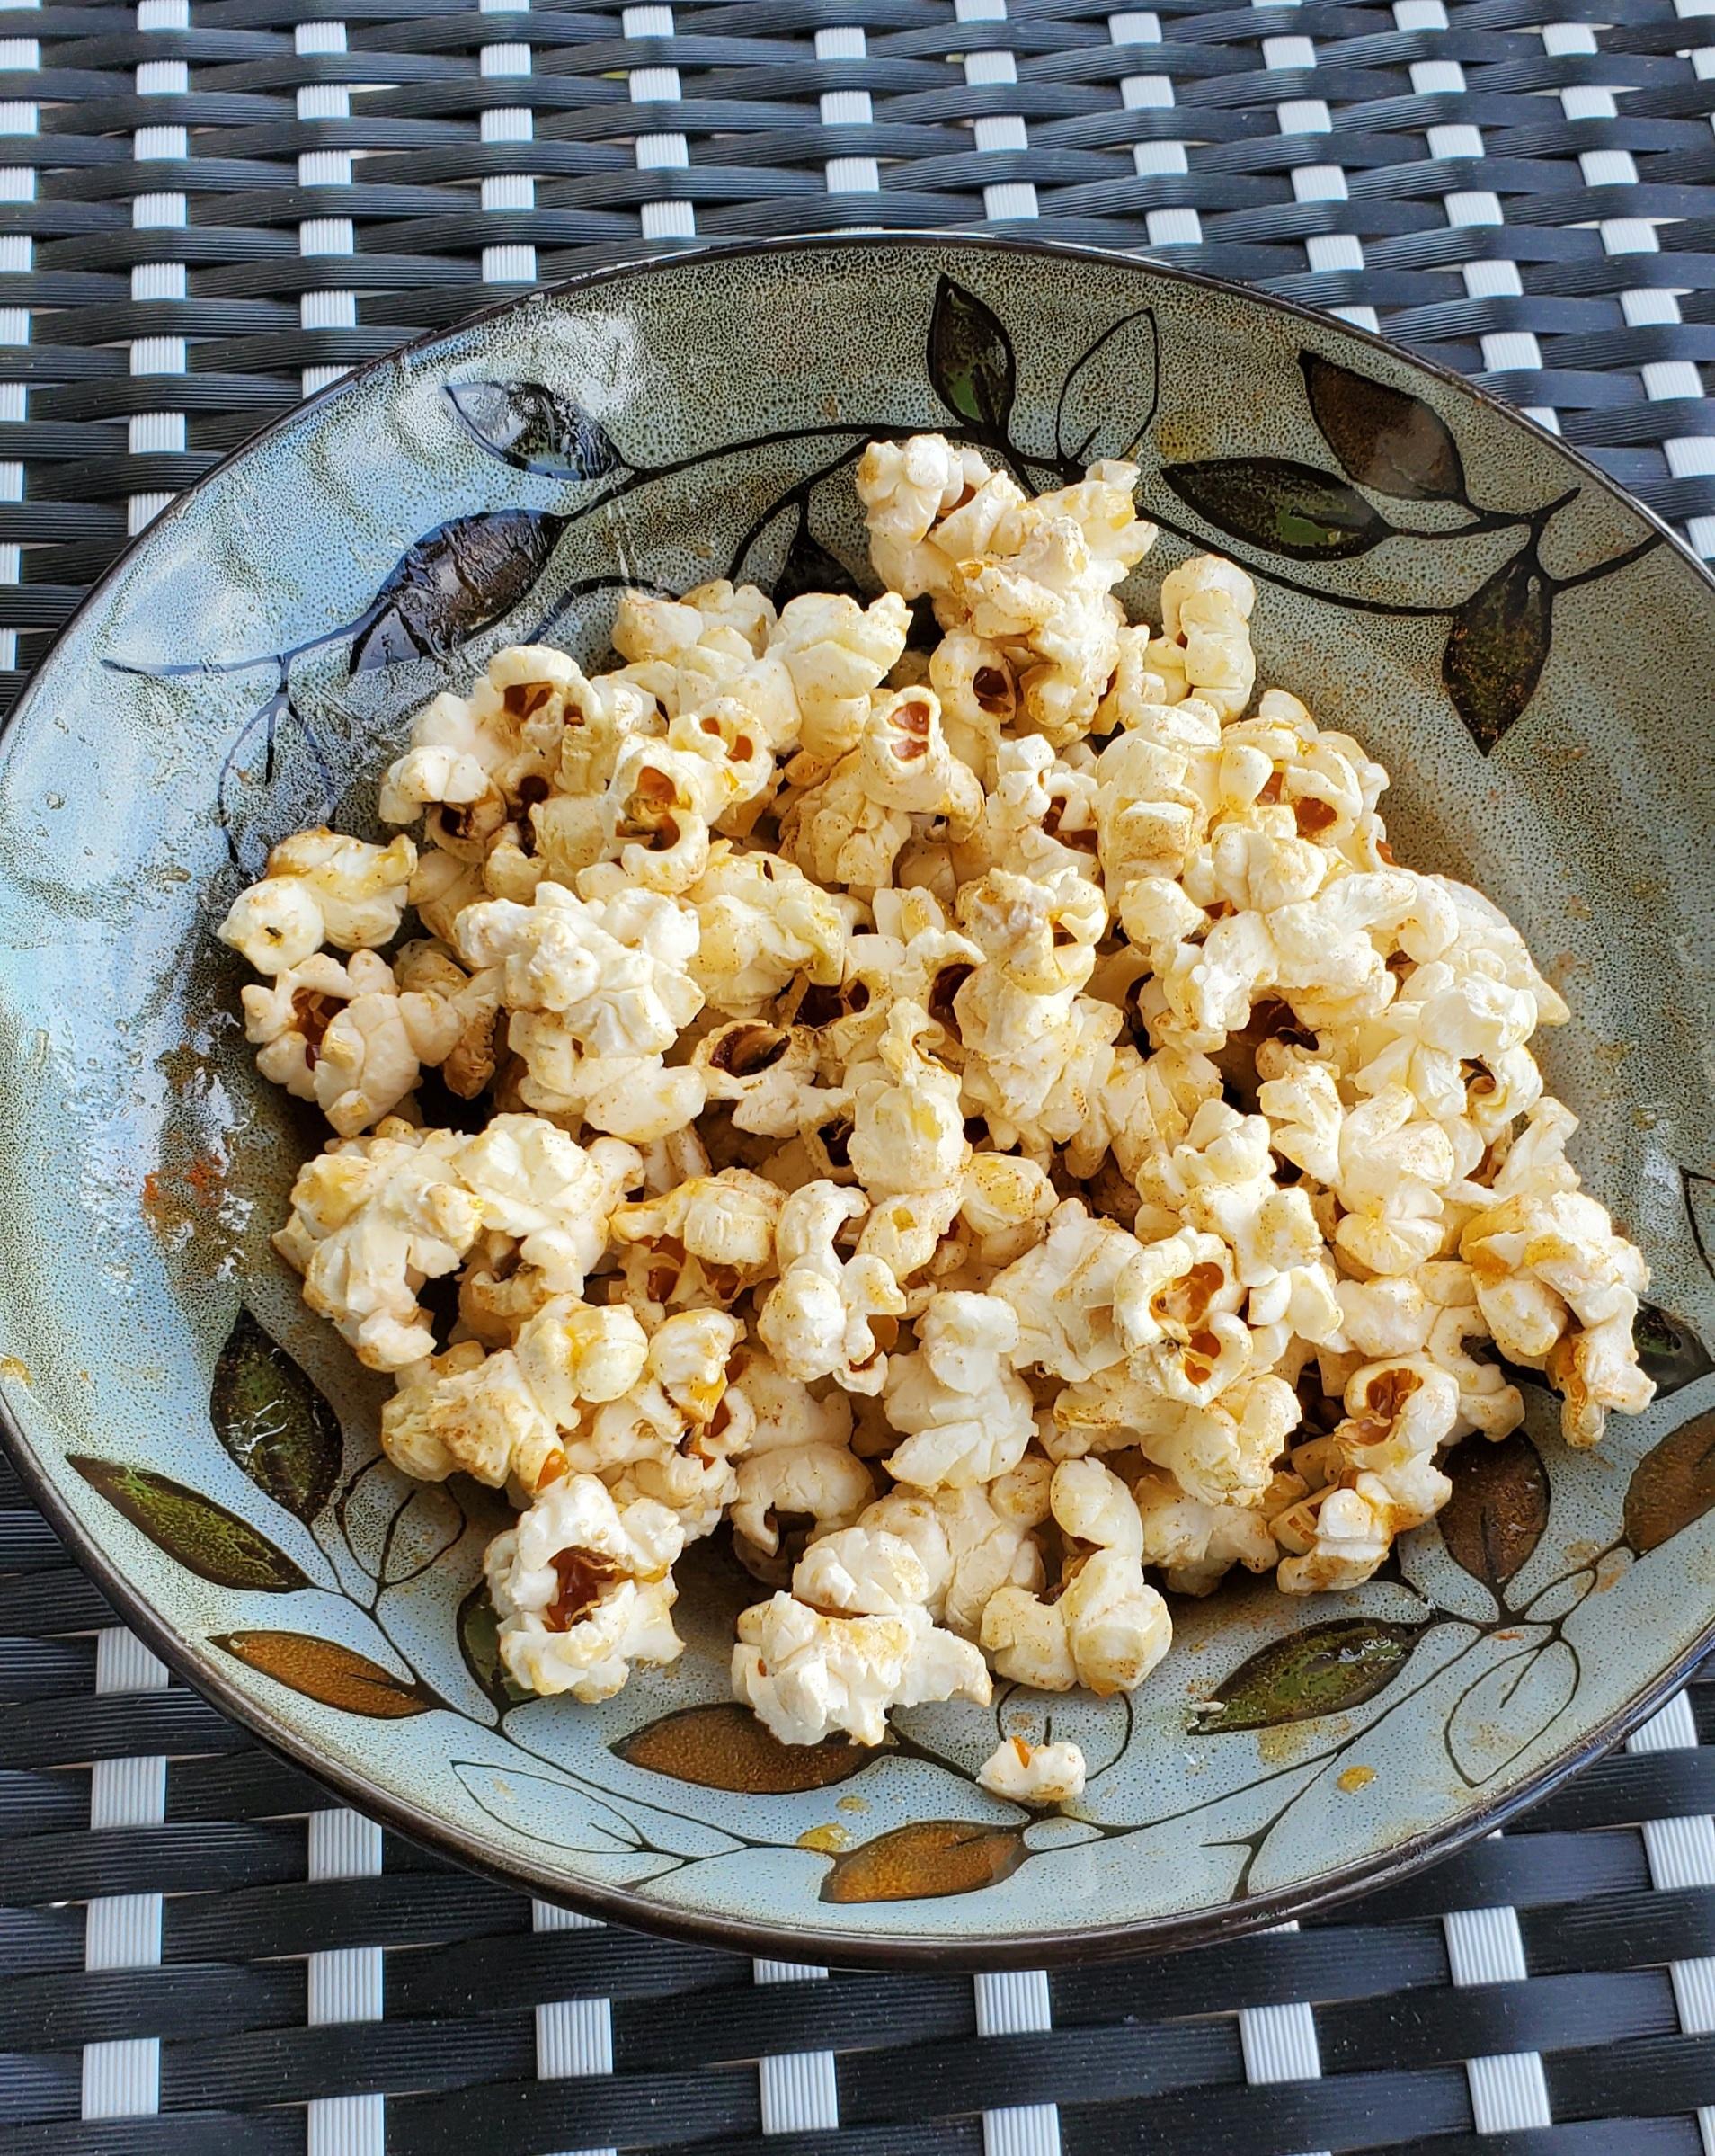 Healthy Popcorn Treat Cindy W